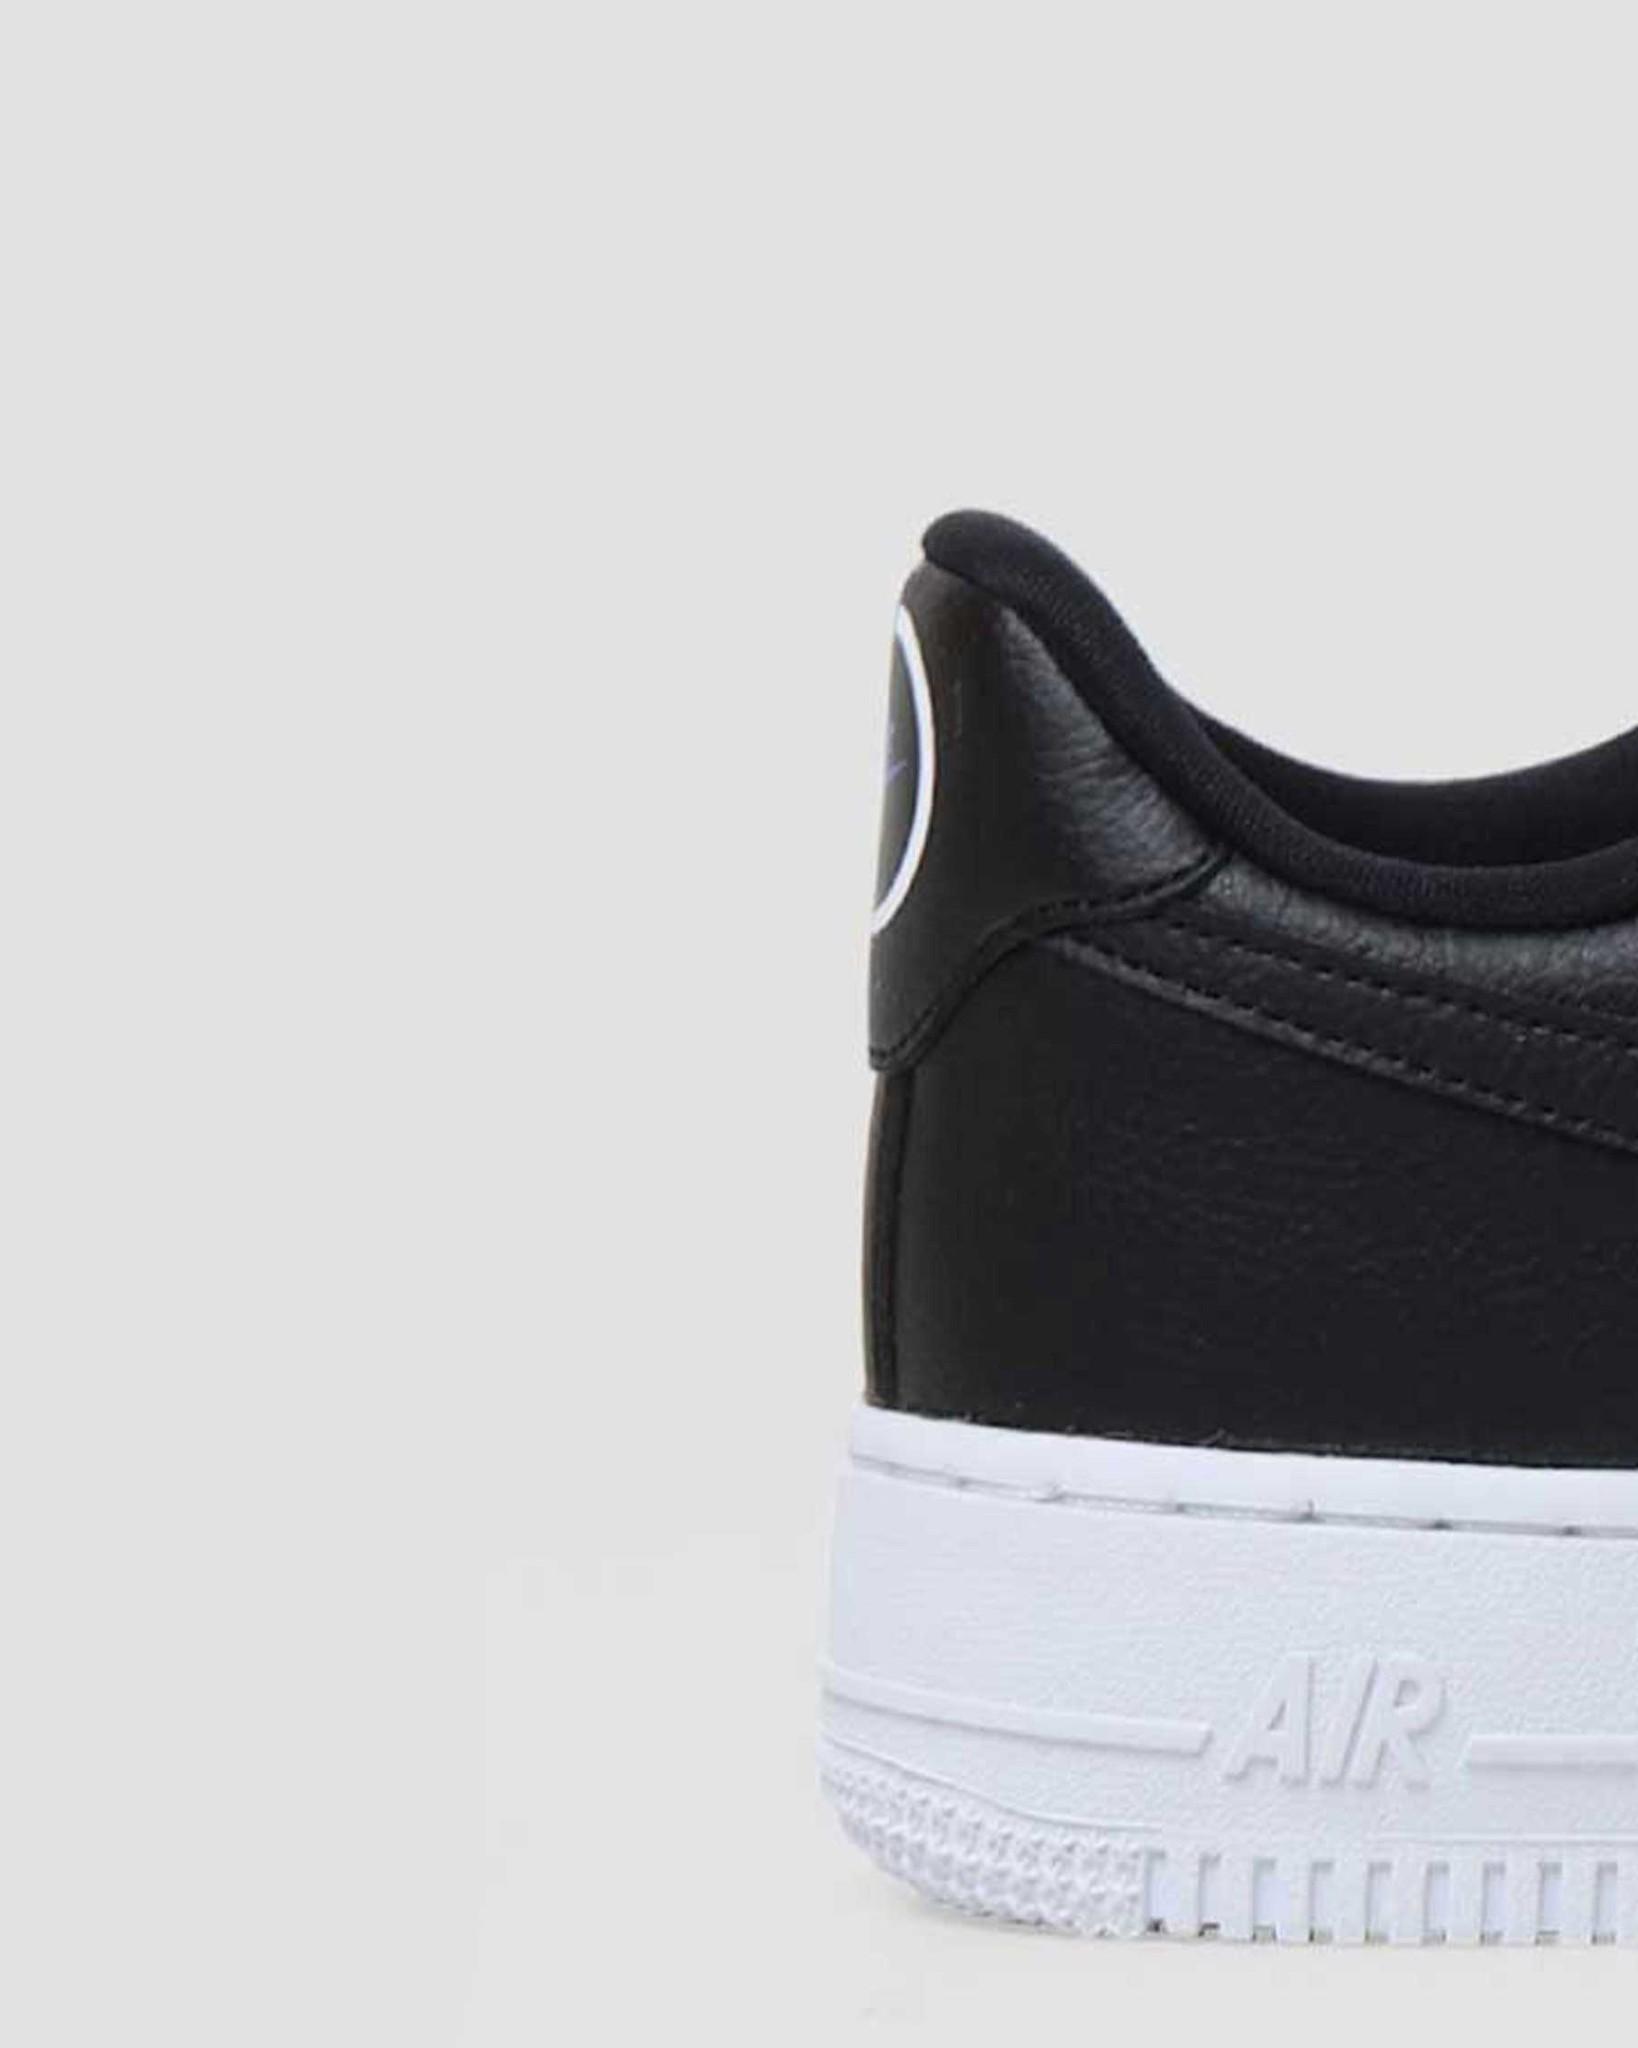 Nike Nike W Air Force 1 07 Lx Black Black Metallic Gold Hyper Royal CT1990-001